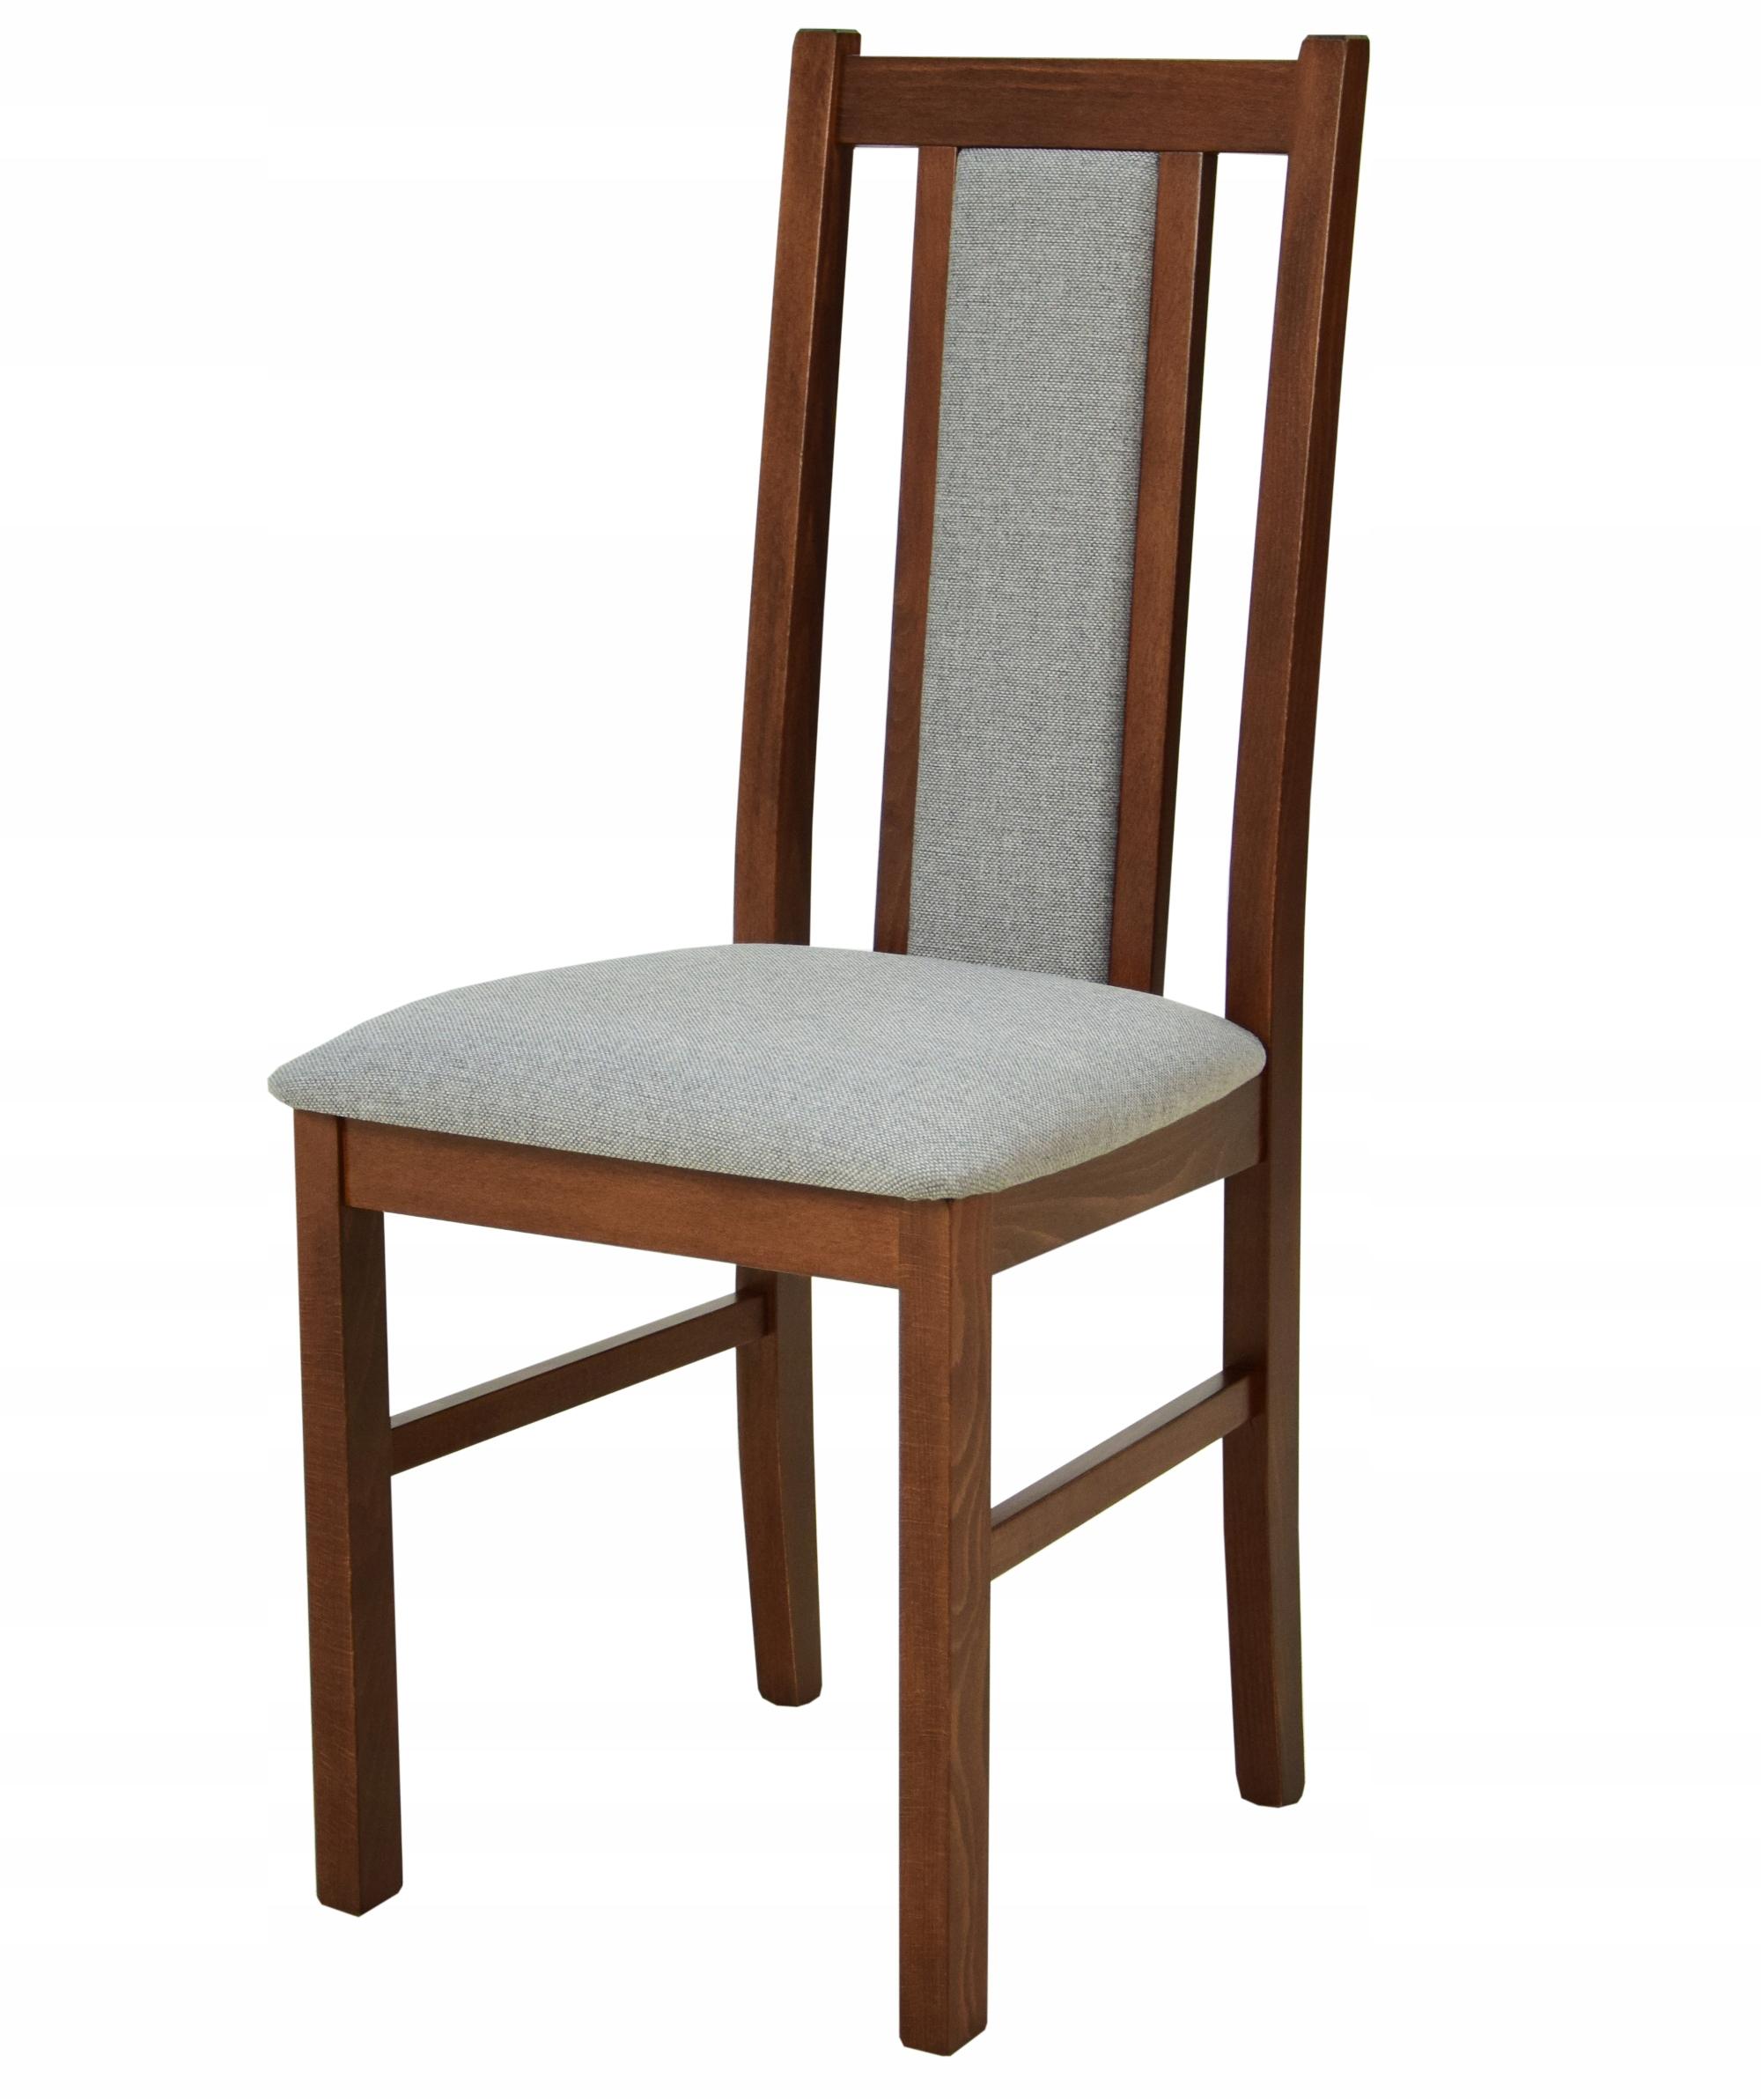 4 stoličky B-14 súbor jedálne, stoličky, Jedálne